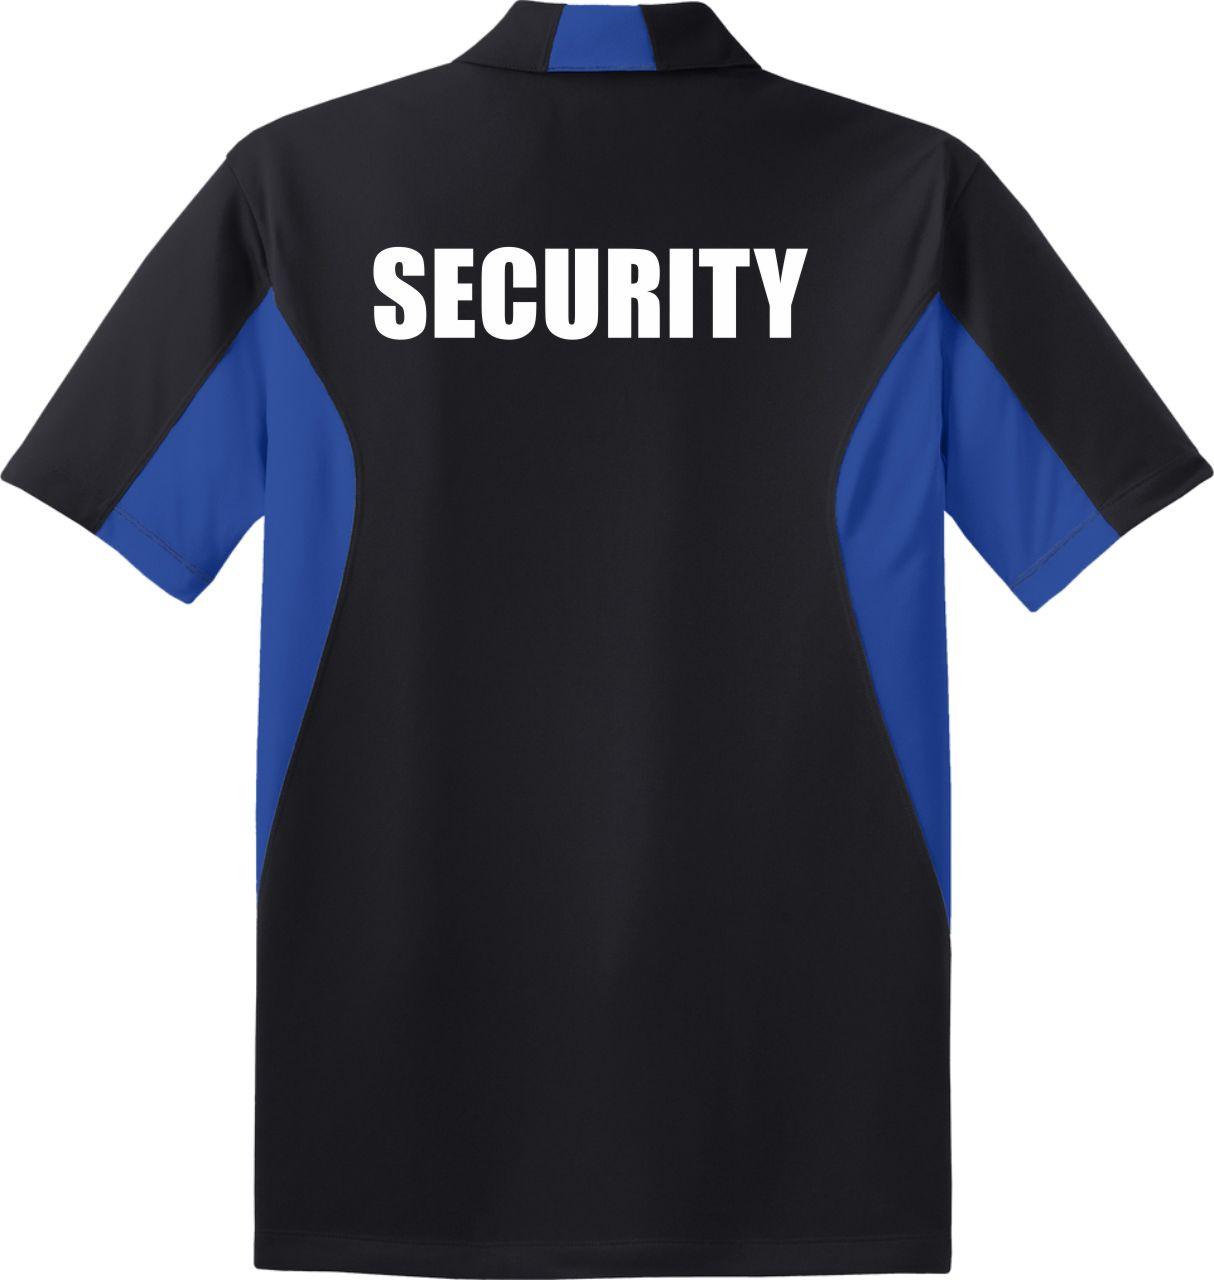 Black Royal Blue Security Polo Uniform Shirt